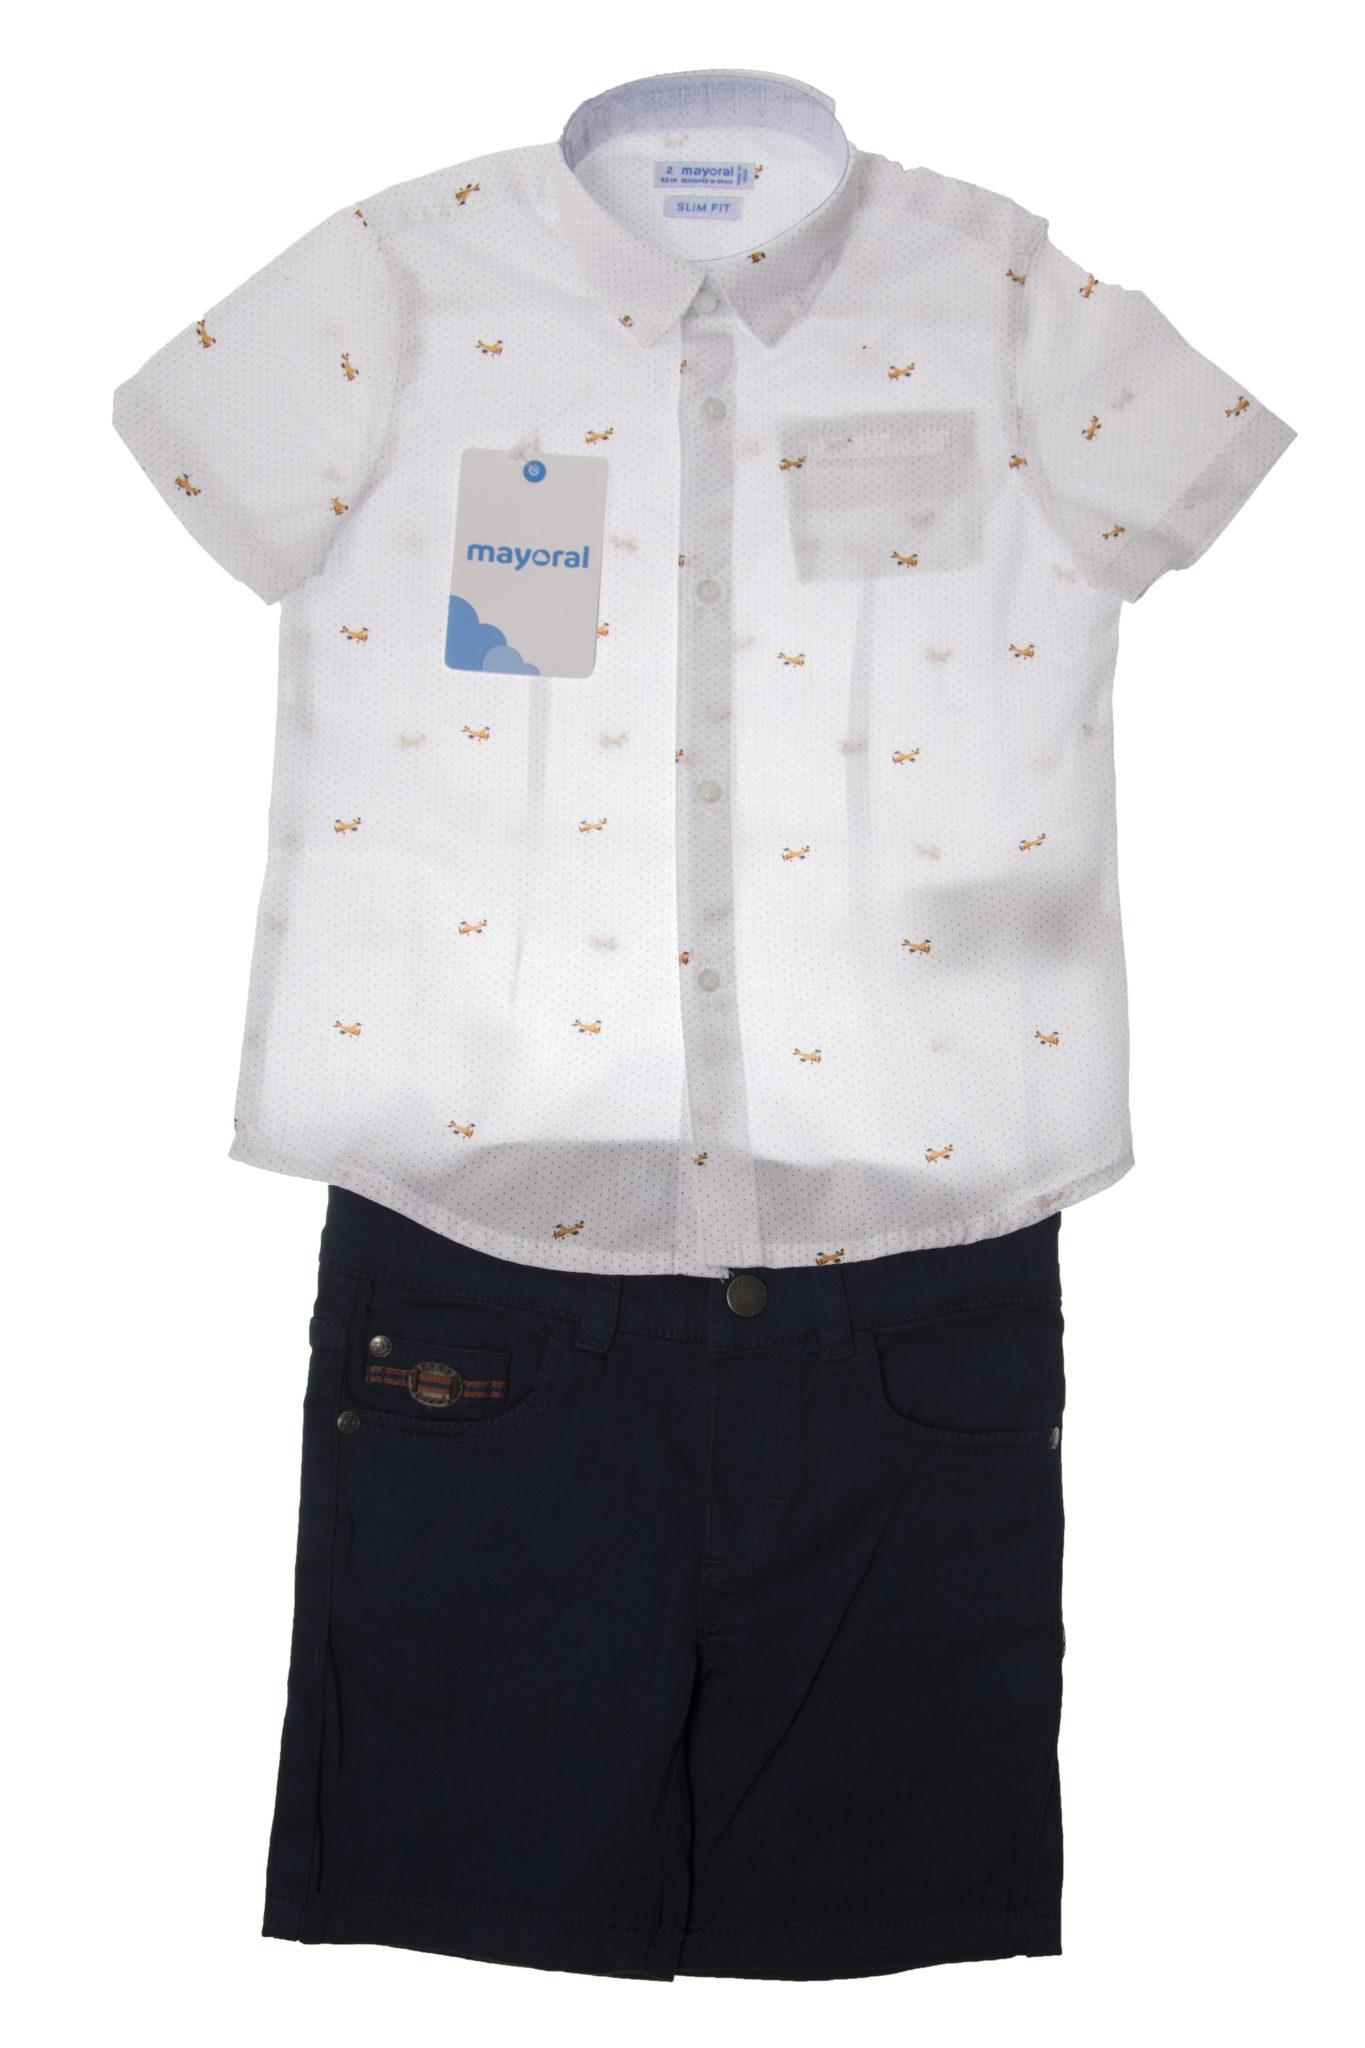 432e591fc94c Σετ ρούχων Mayoral με βερμούδα και πουκάμισο - Baby 03